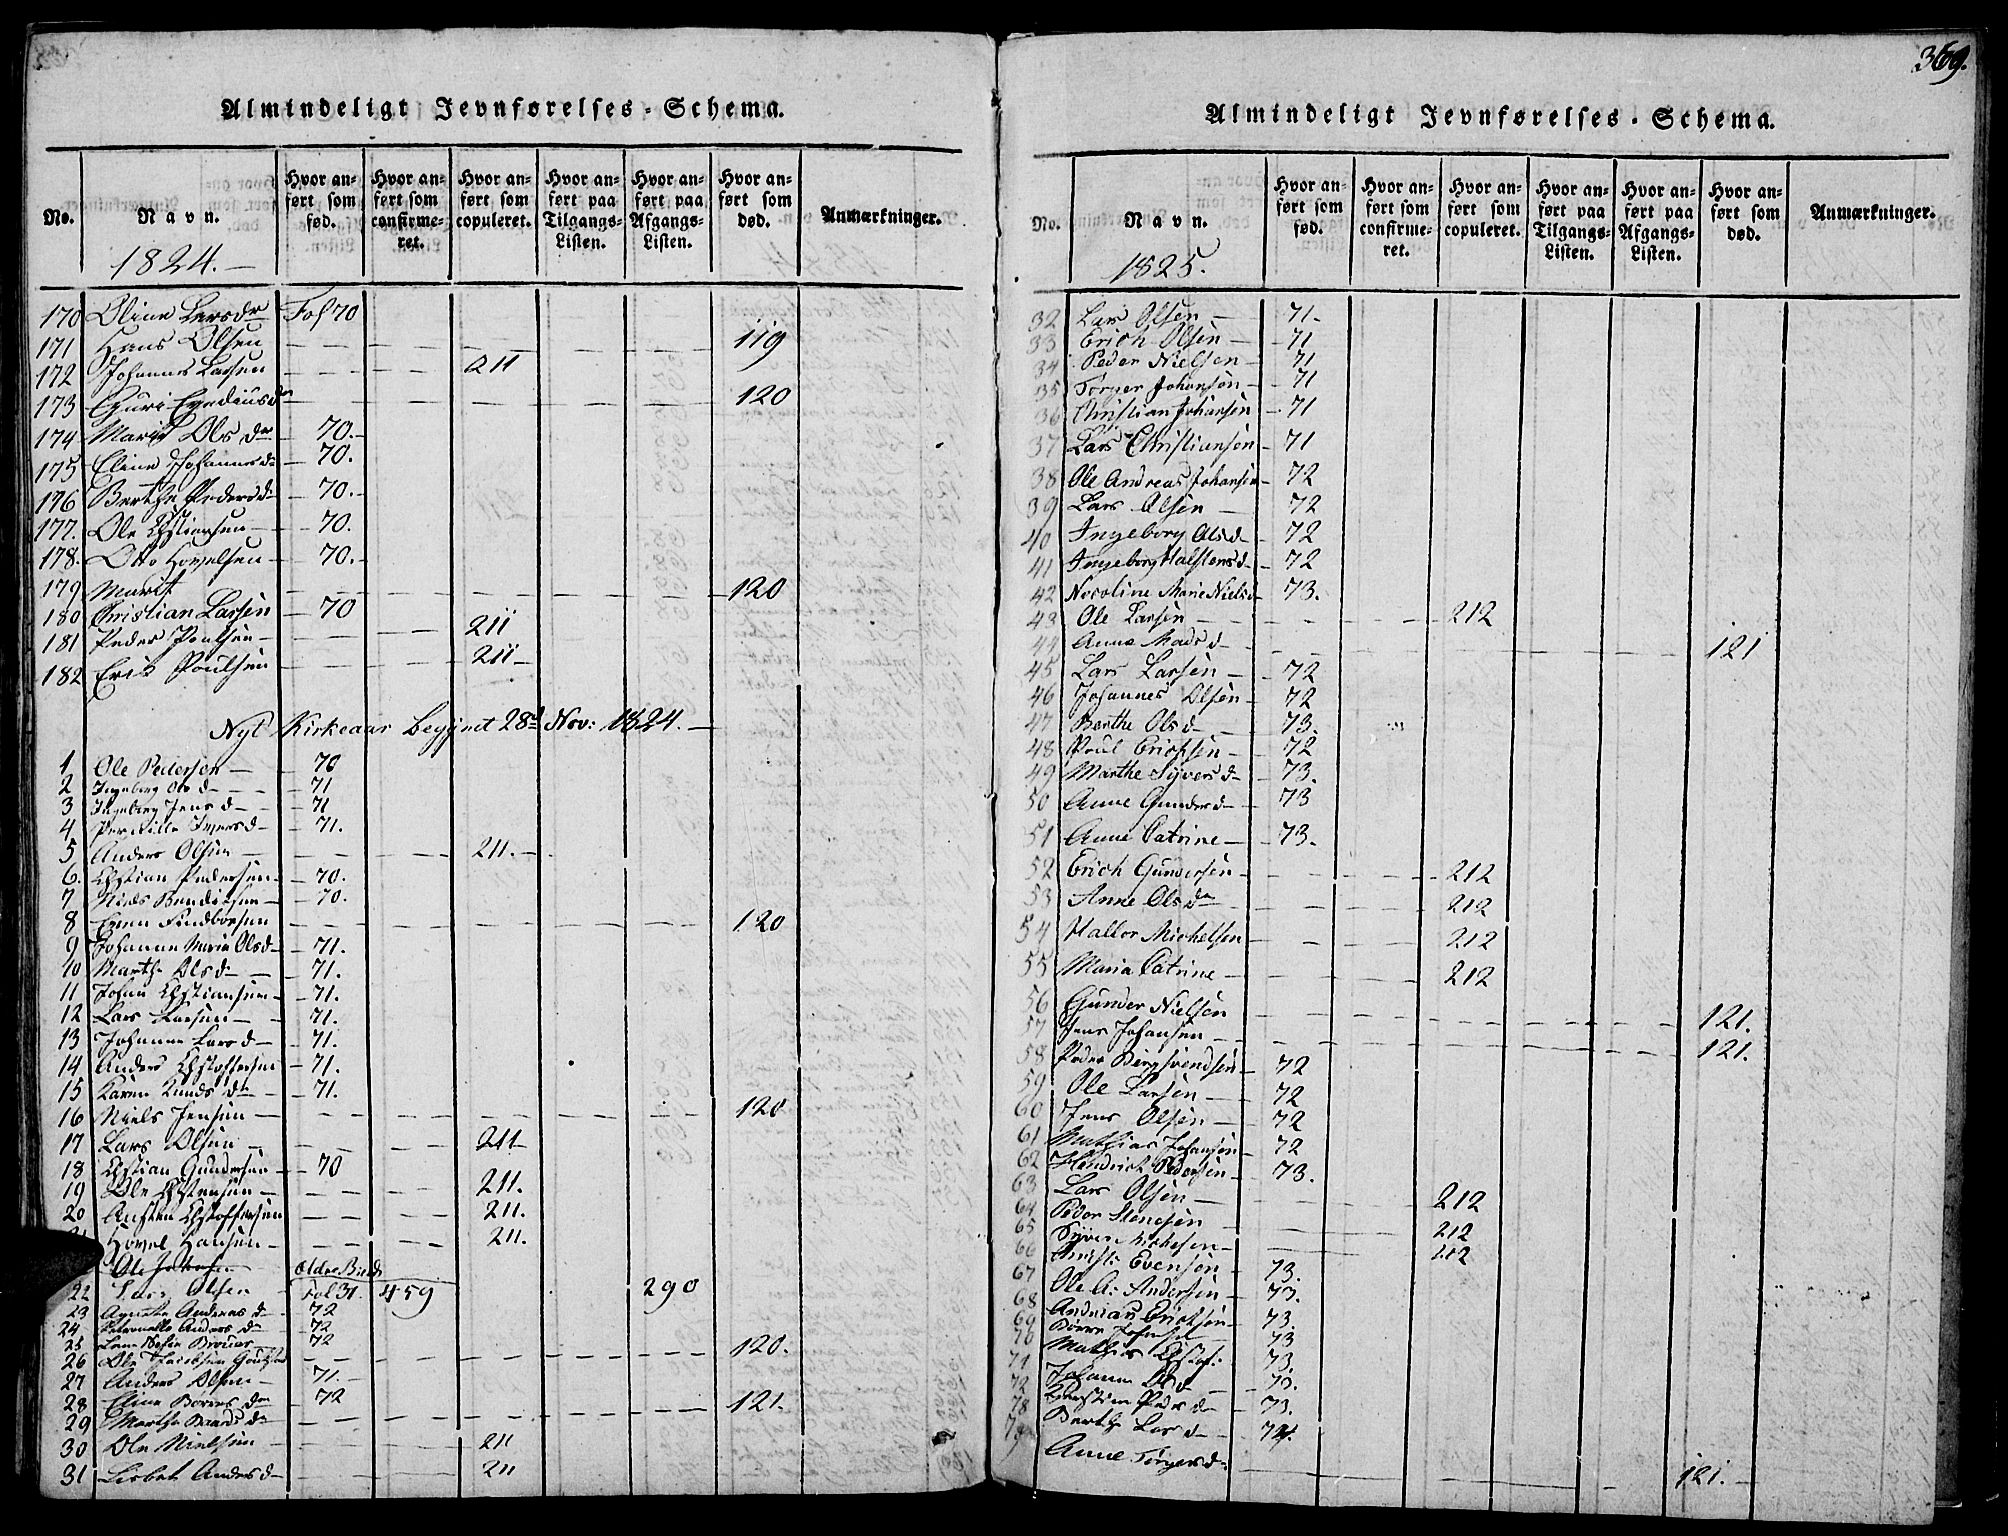 SAH, Biri prestekontor, Ministerialbok nr. 3, 1814-1828, s. 369